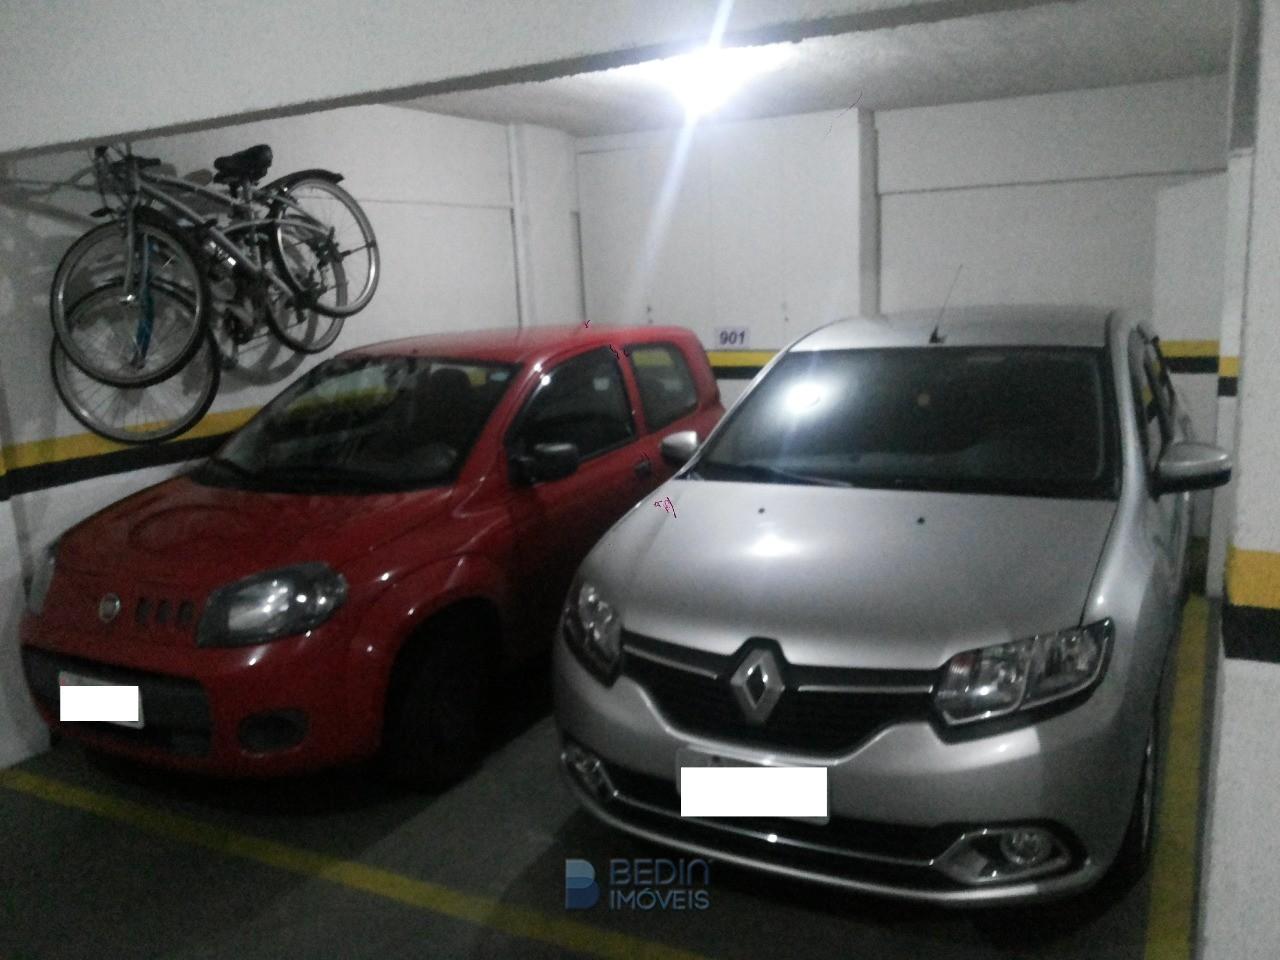 Bedin Imóveis -  Garagem